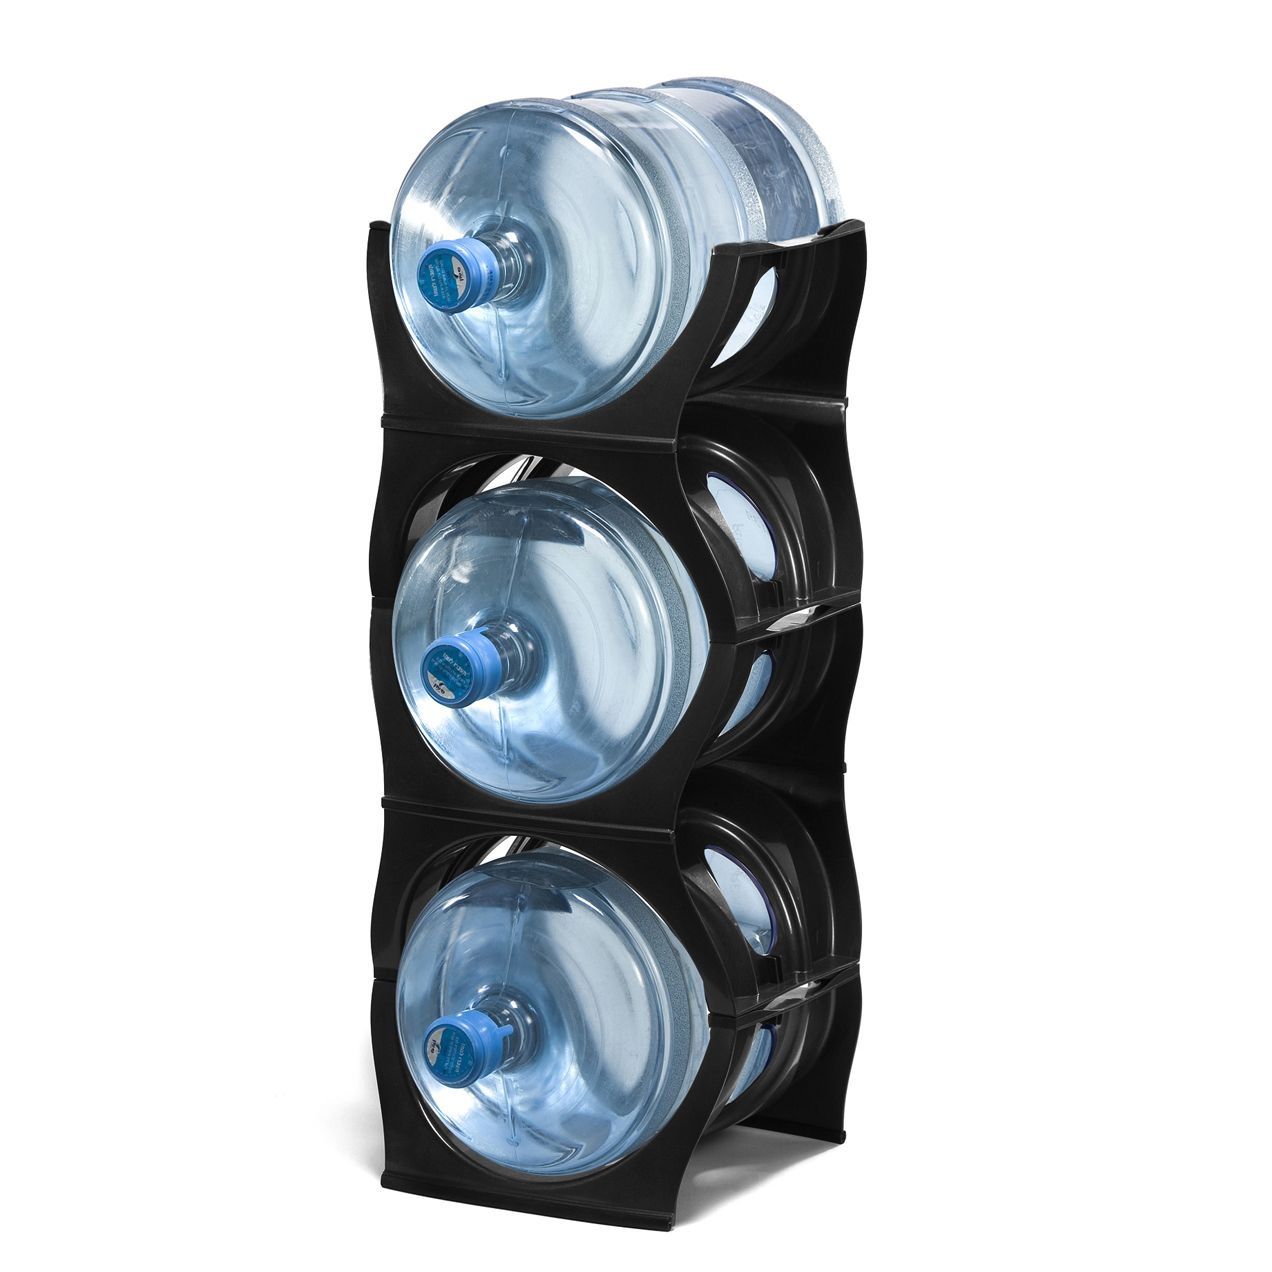 Black Water Bottle Rack For 3 Bottles 3 5 Gallon Jugs Storage